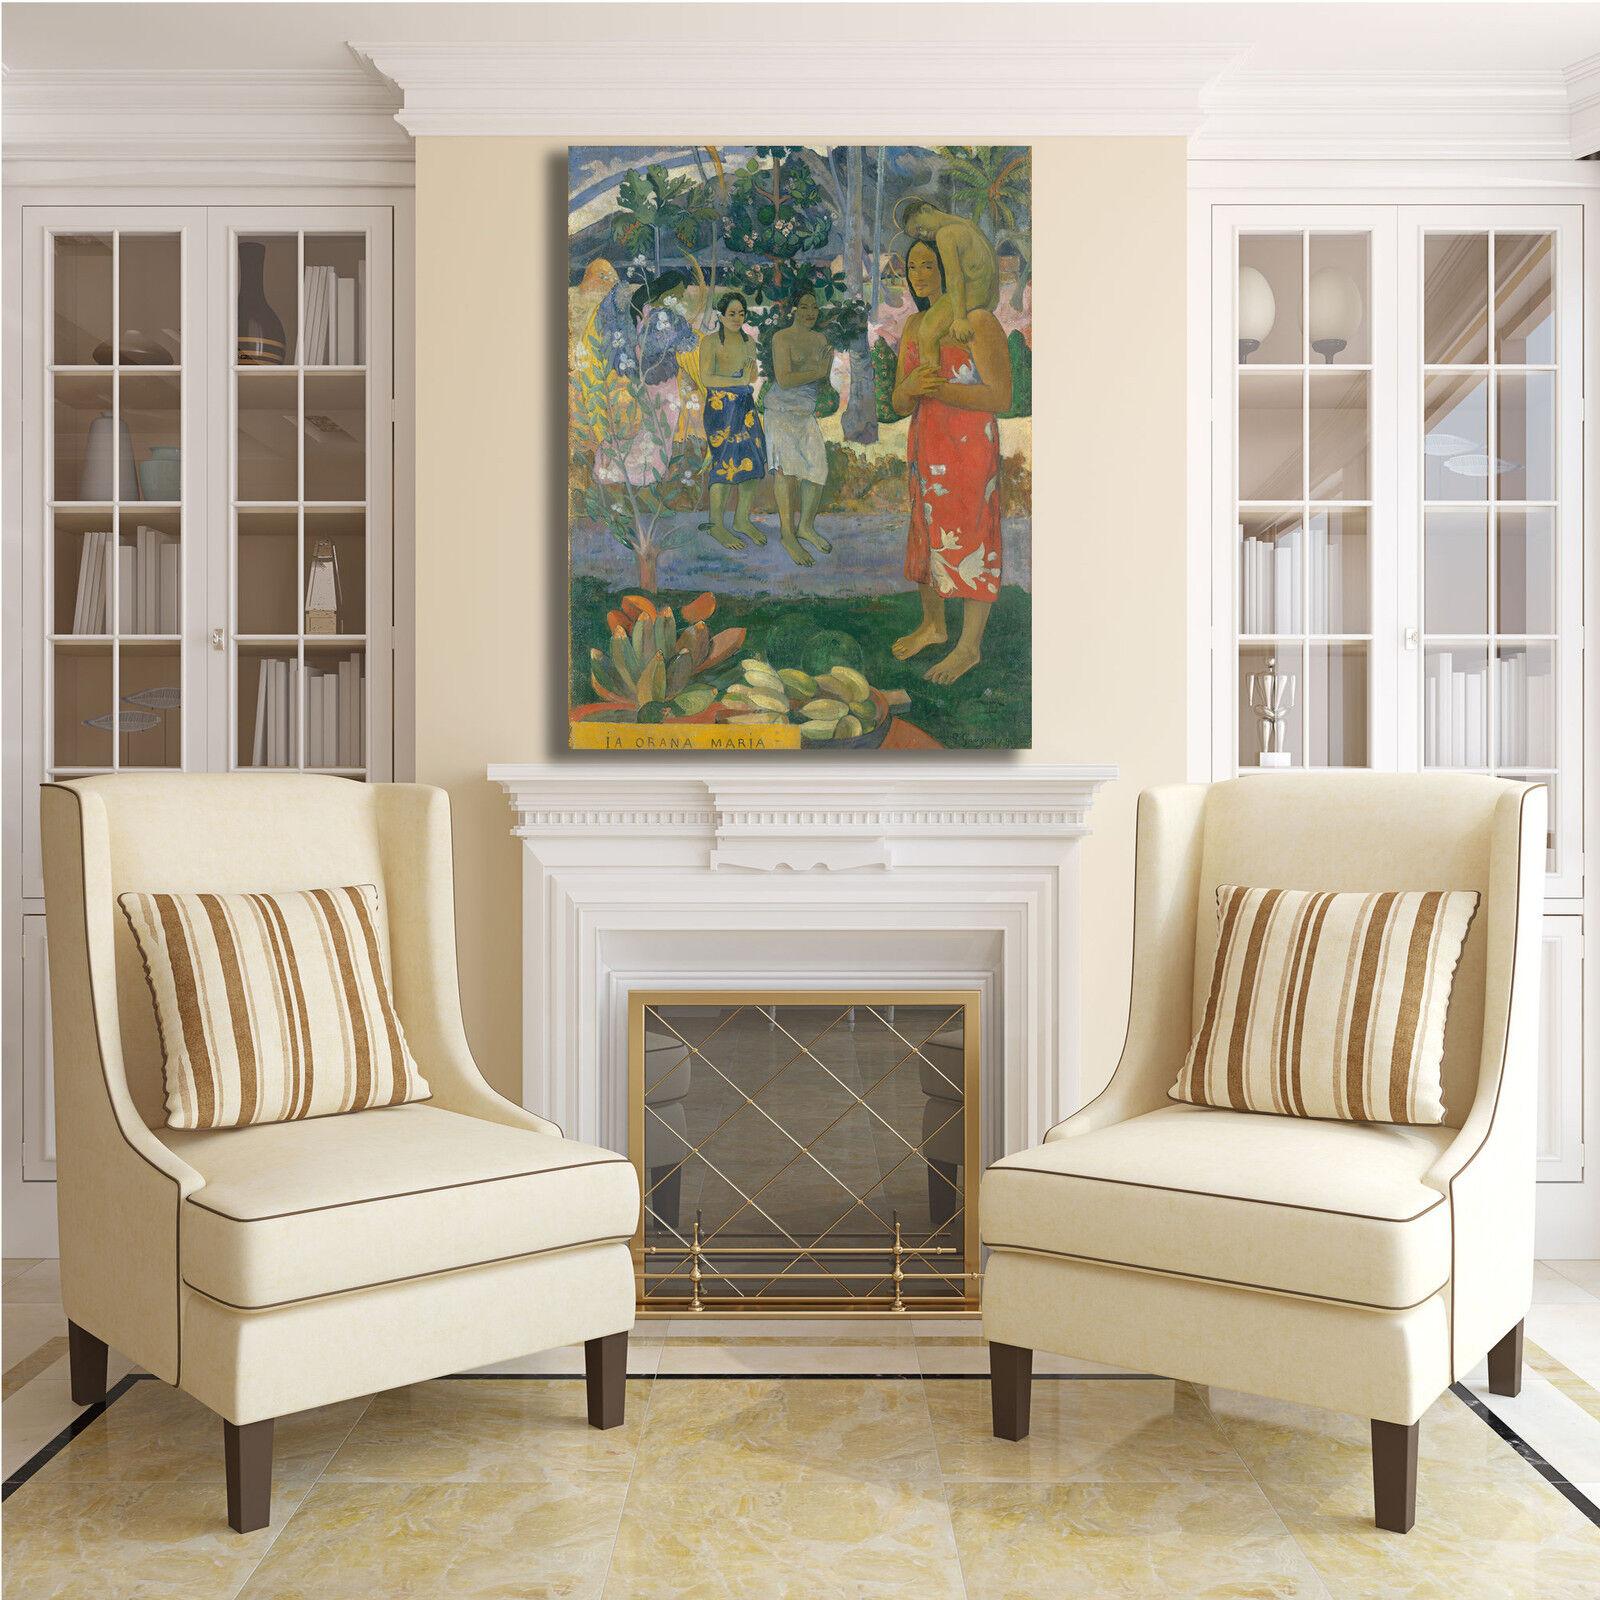 Gauguin ave orana maria design quadro stampa tela o dipinto telaio arRouge o tela casa c5cf35